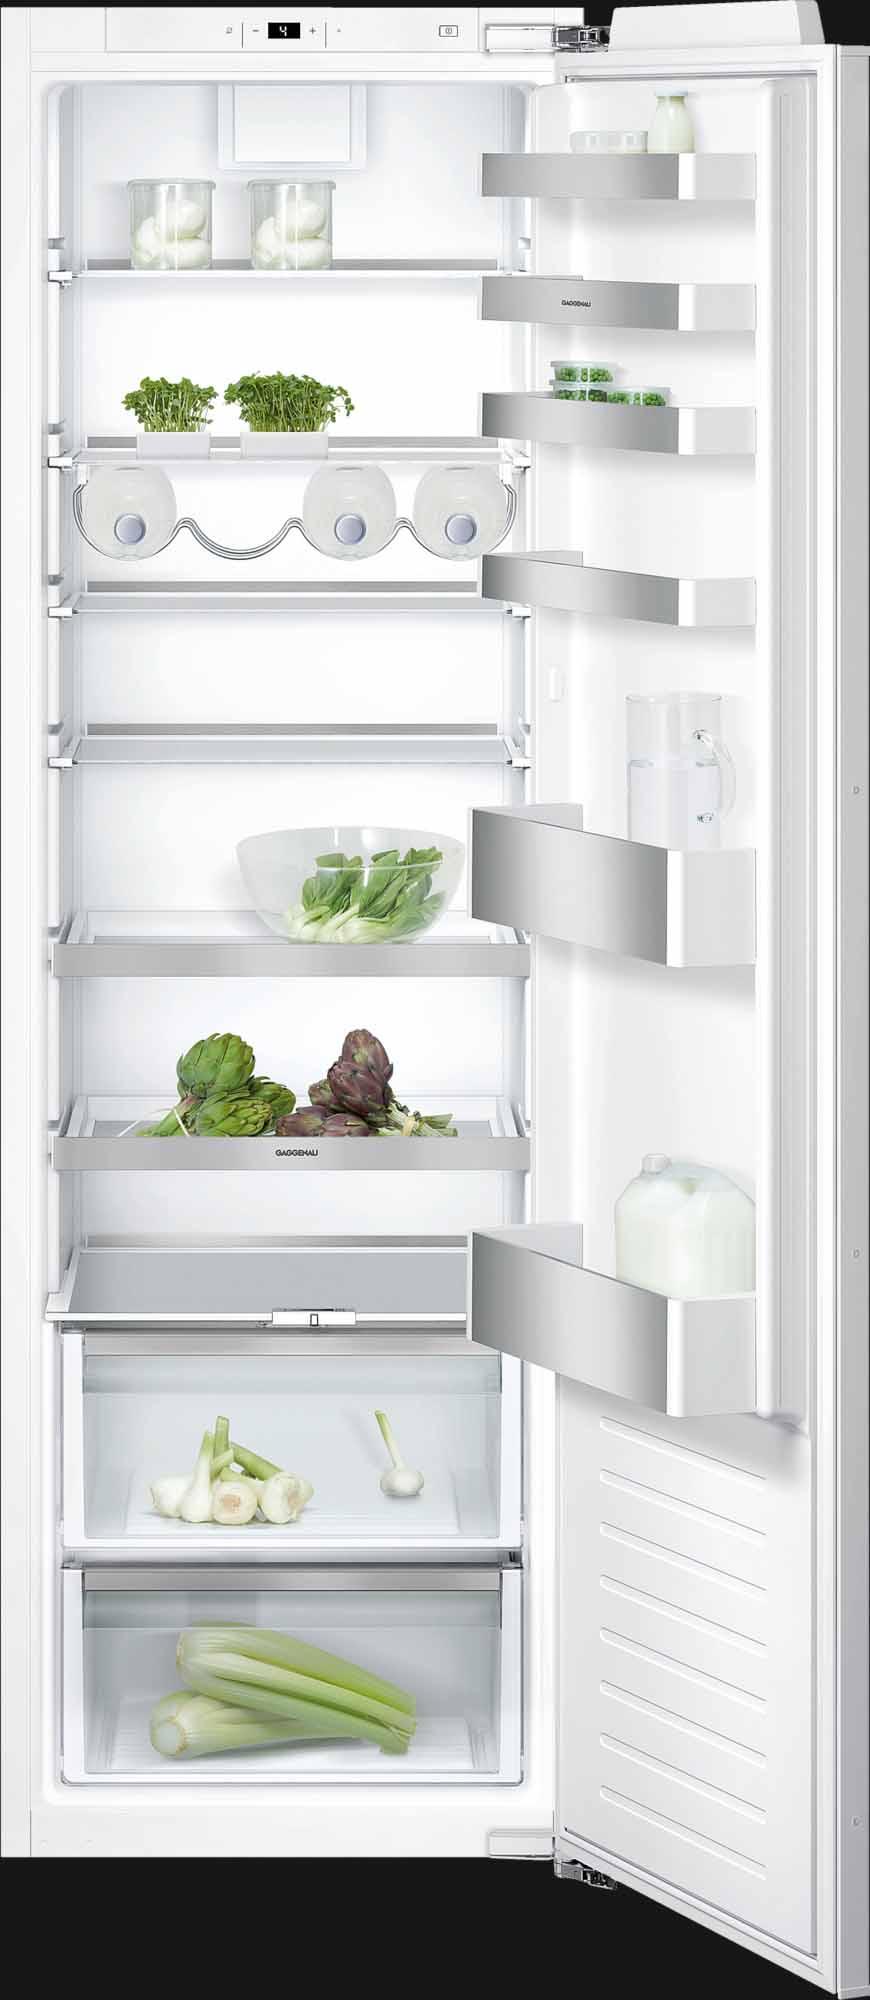 Холодильный шкаф GAGGENAU серии 200 RC282205